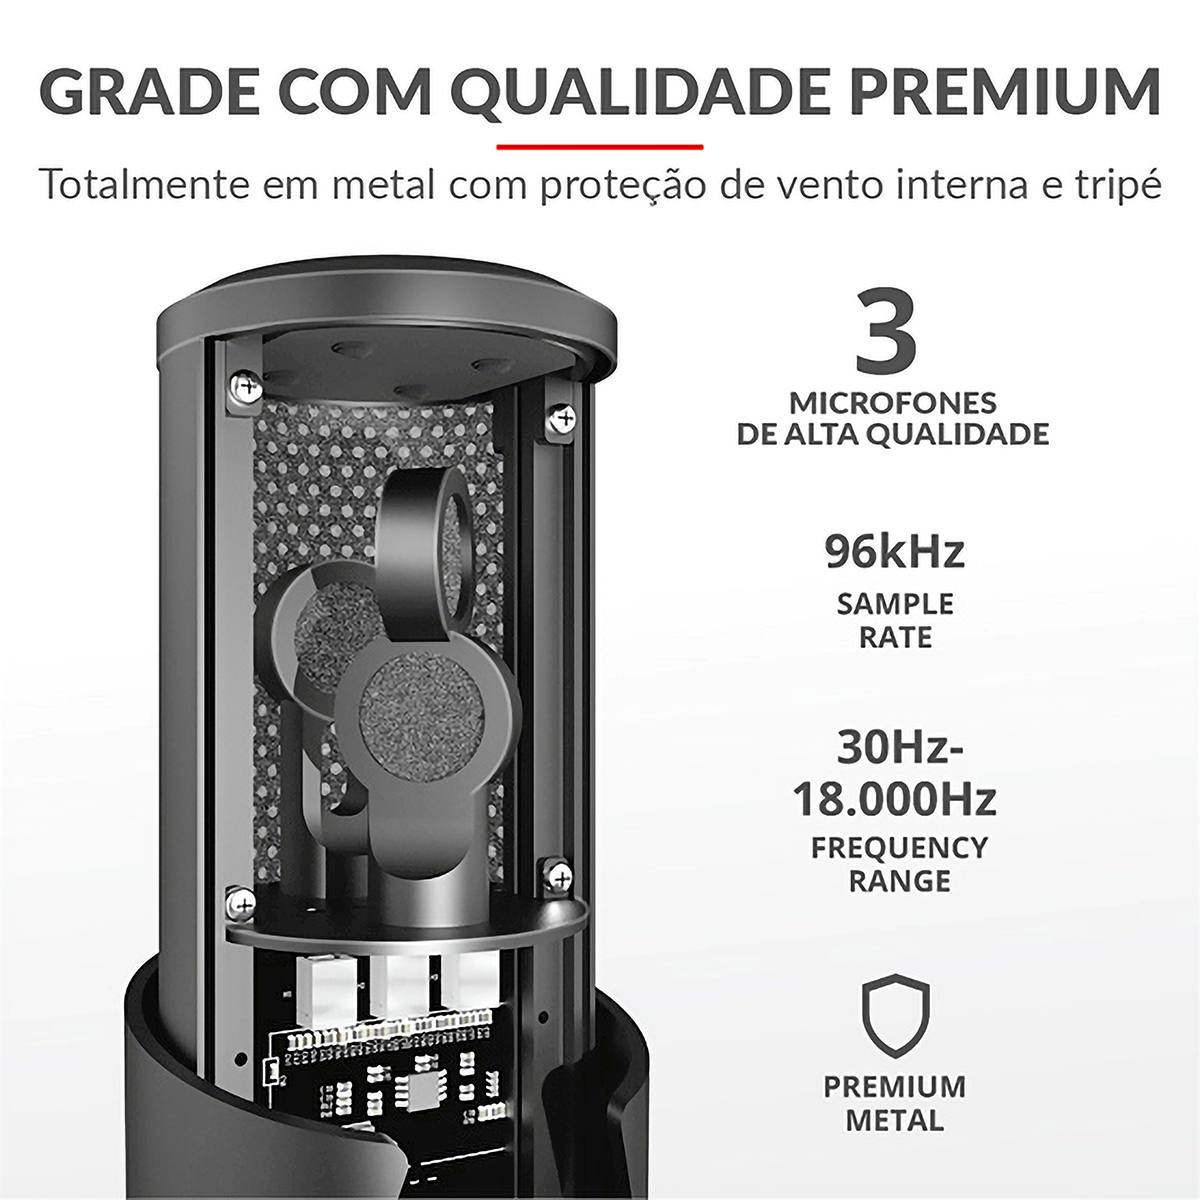 Microfone de Mesa USB 4 em 1 Omnidirecional Bidirecional Cardioide e Estéreo Monitor de Latência Zero Trust GXT 258 Fyru